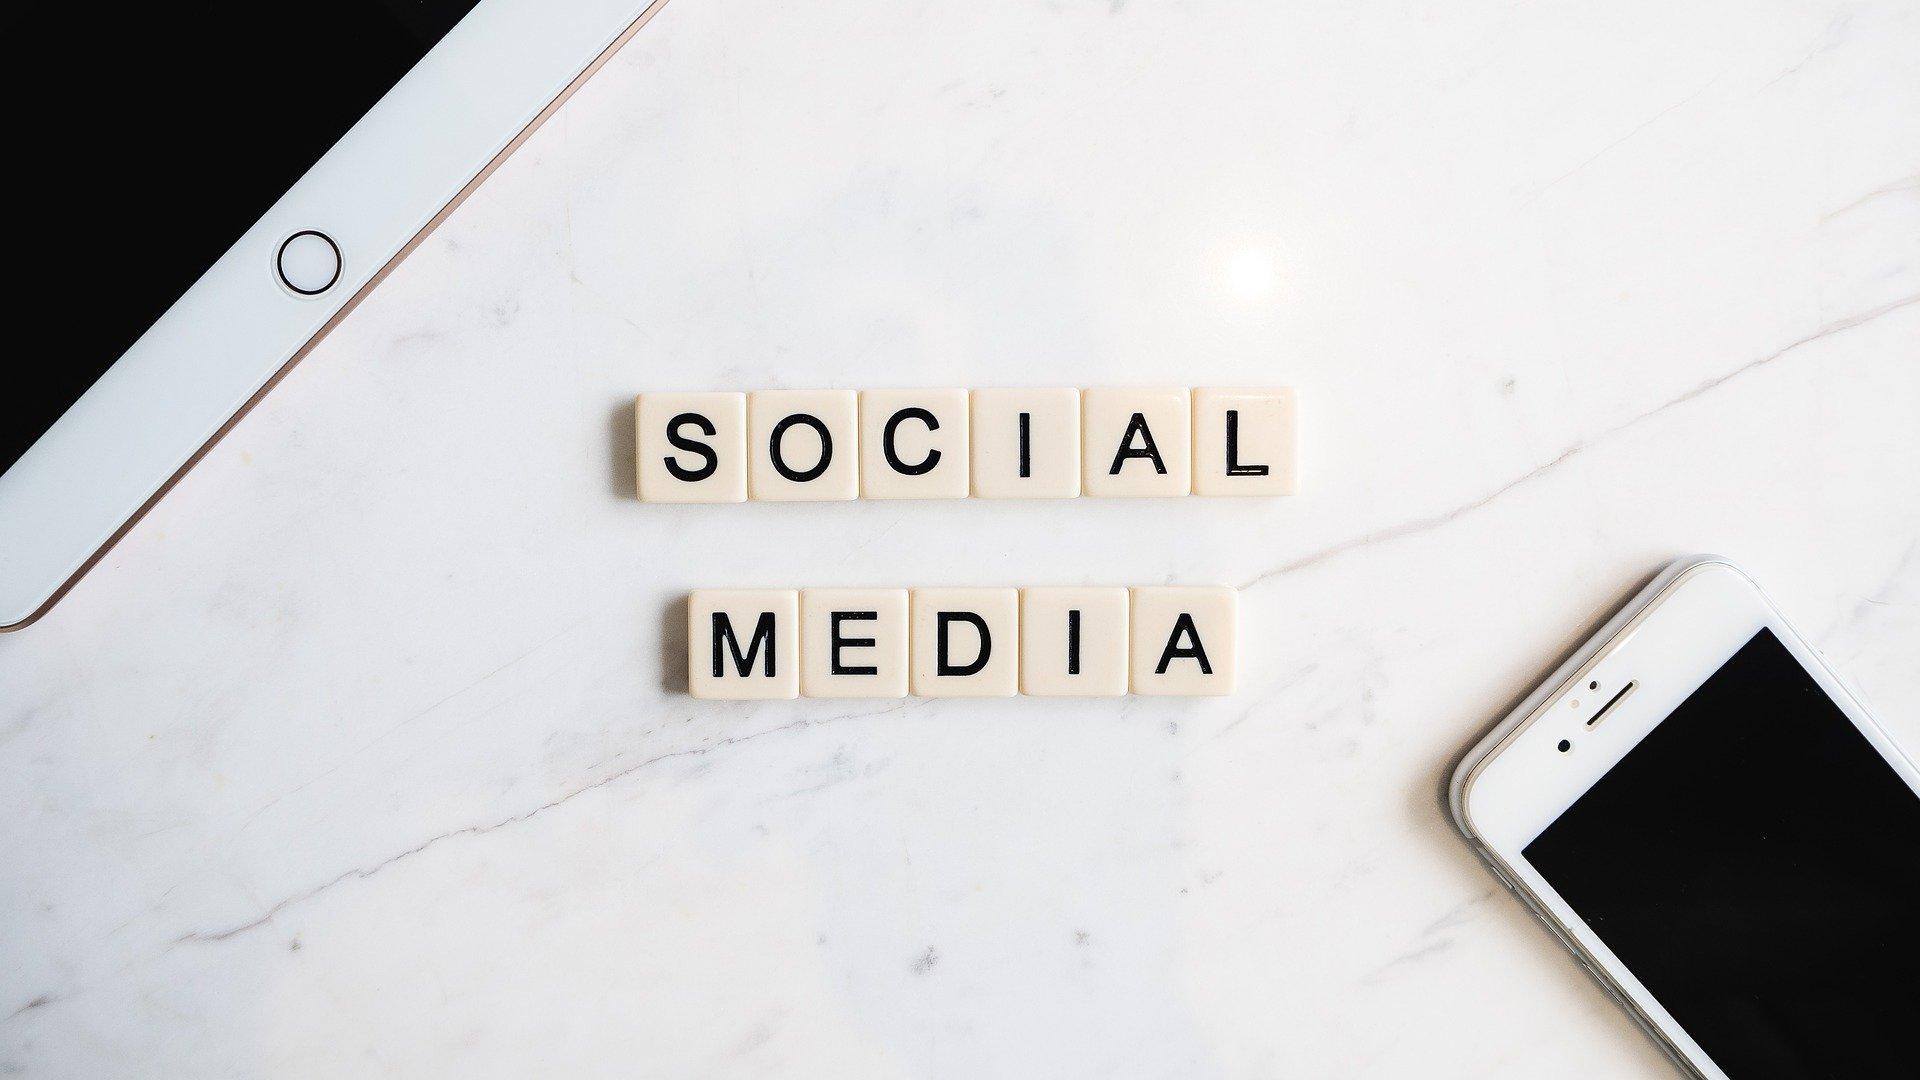 Social-Media-Profilerstellung/-optimierung